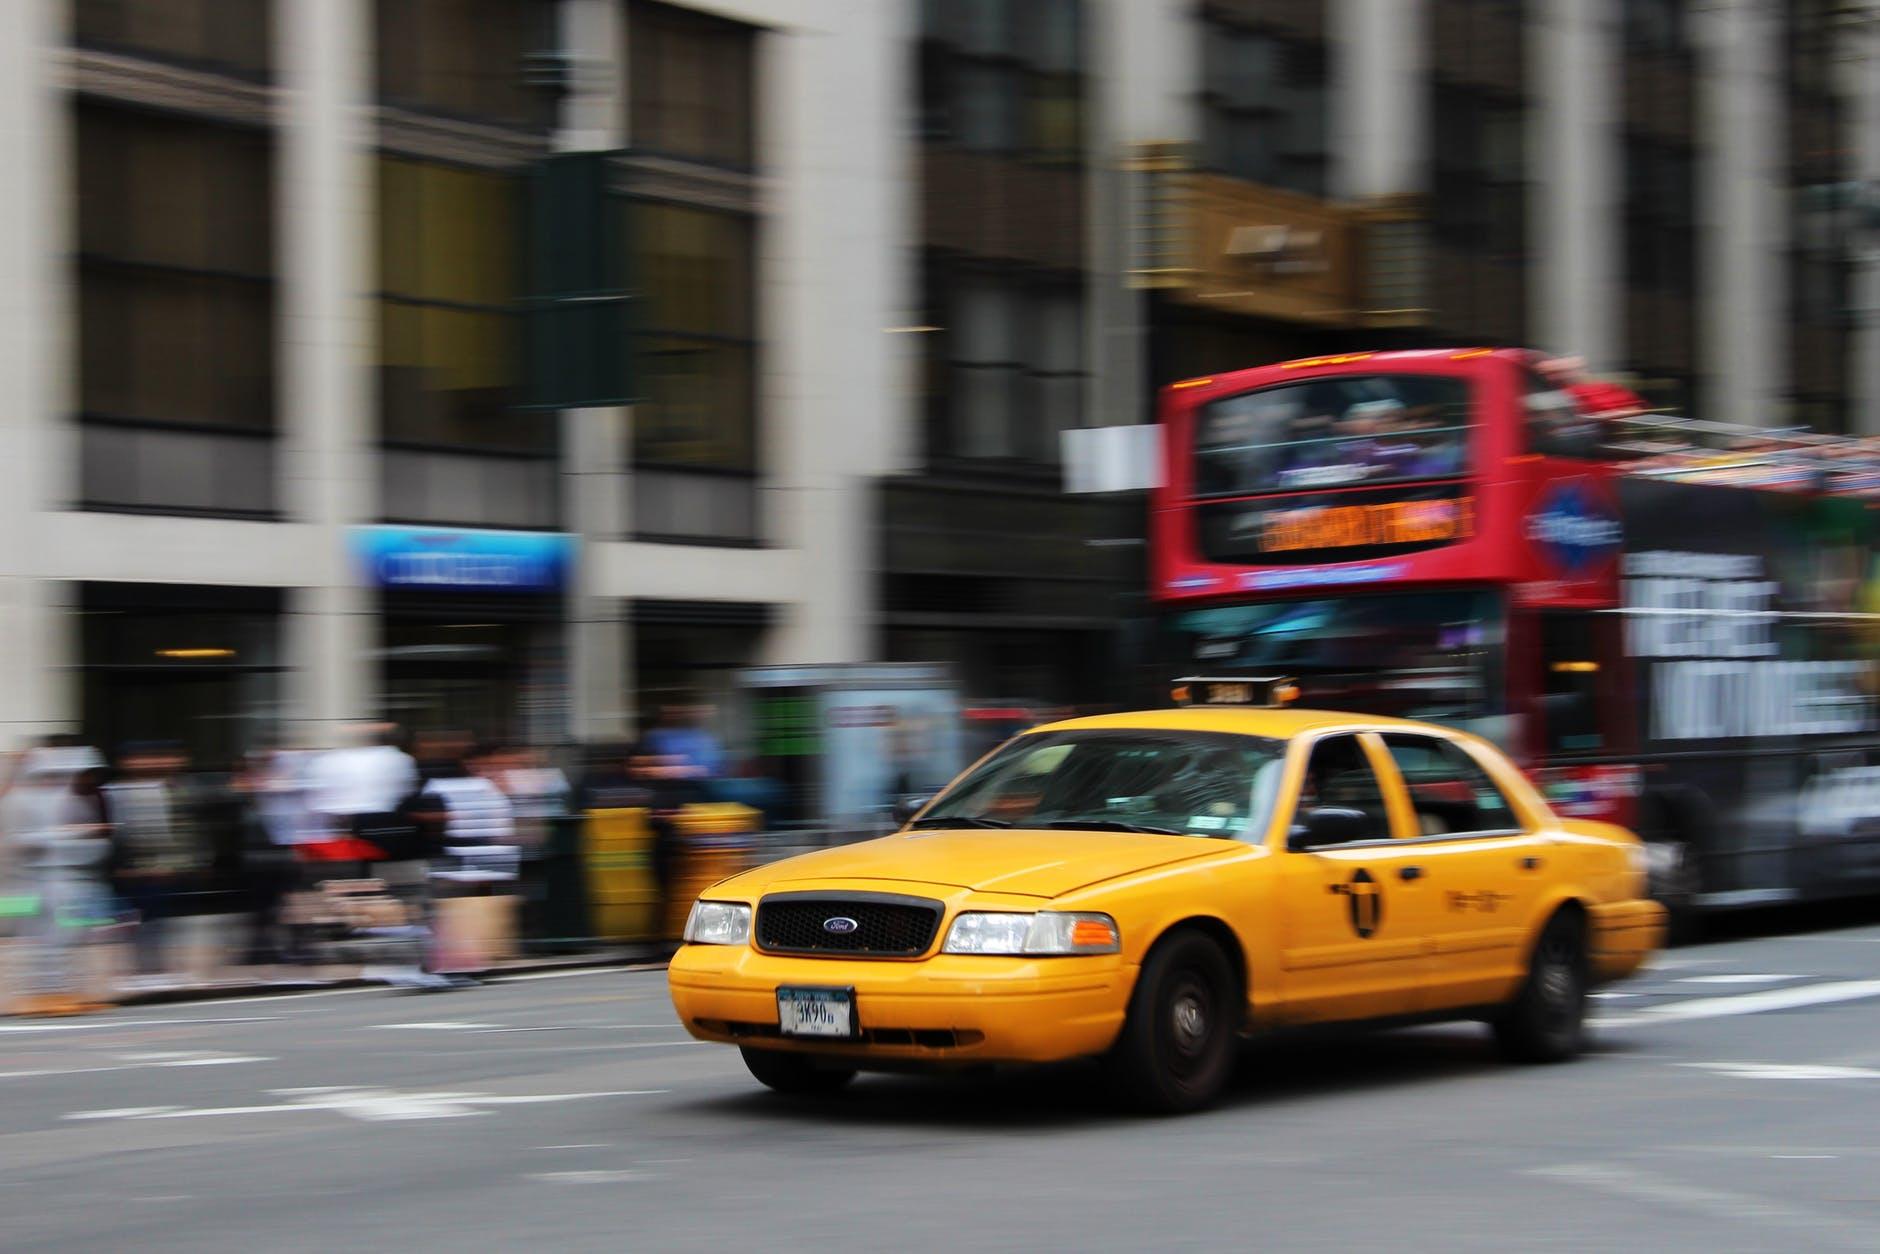 selective focus photography of yellow sedan